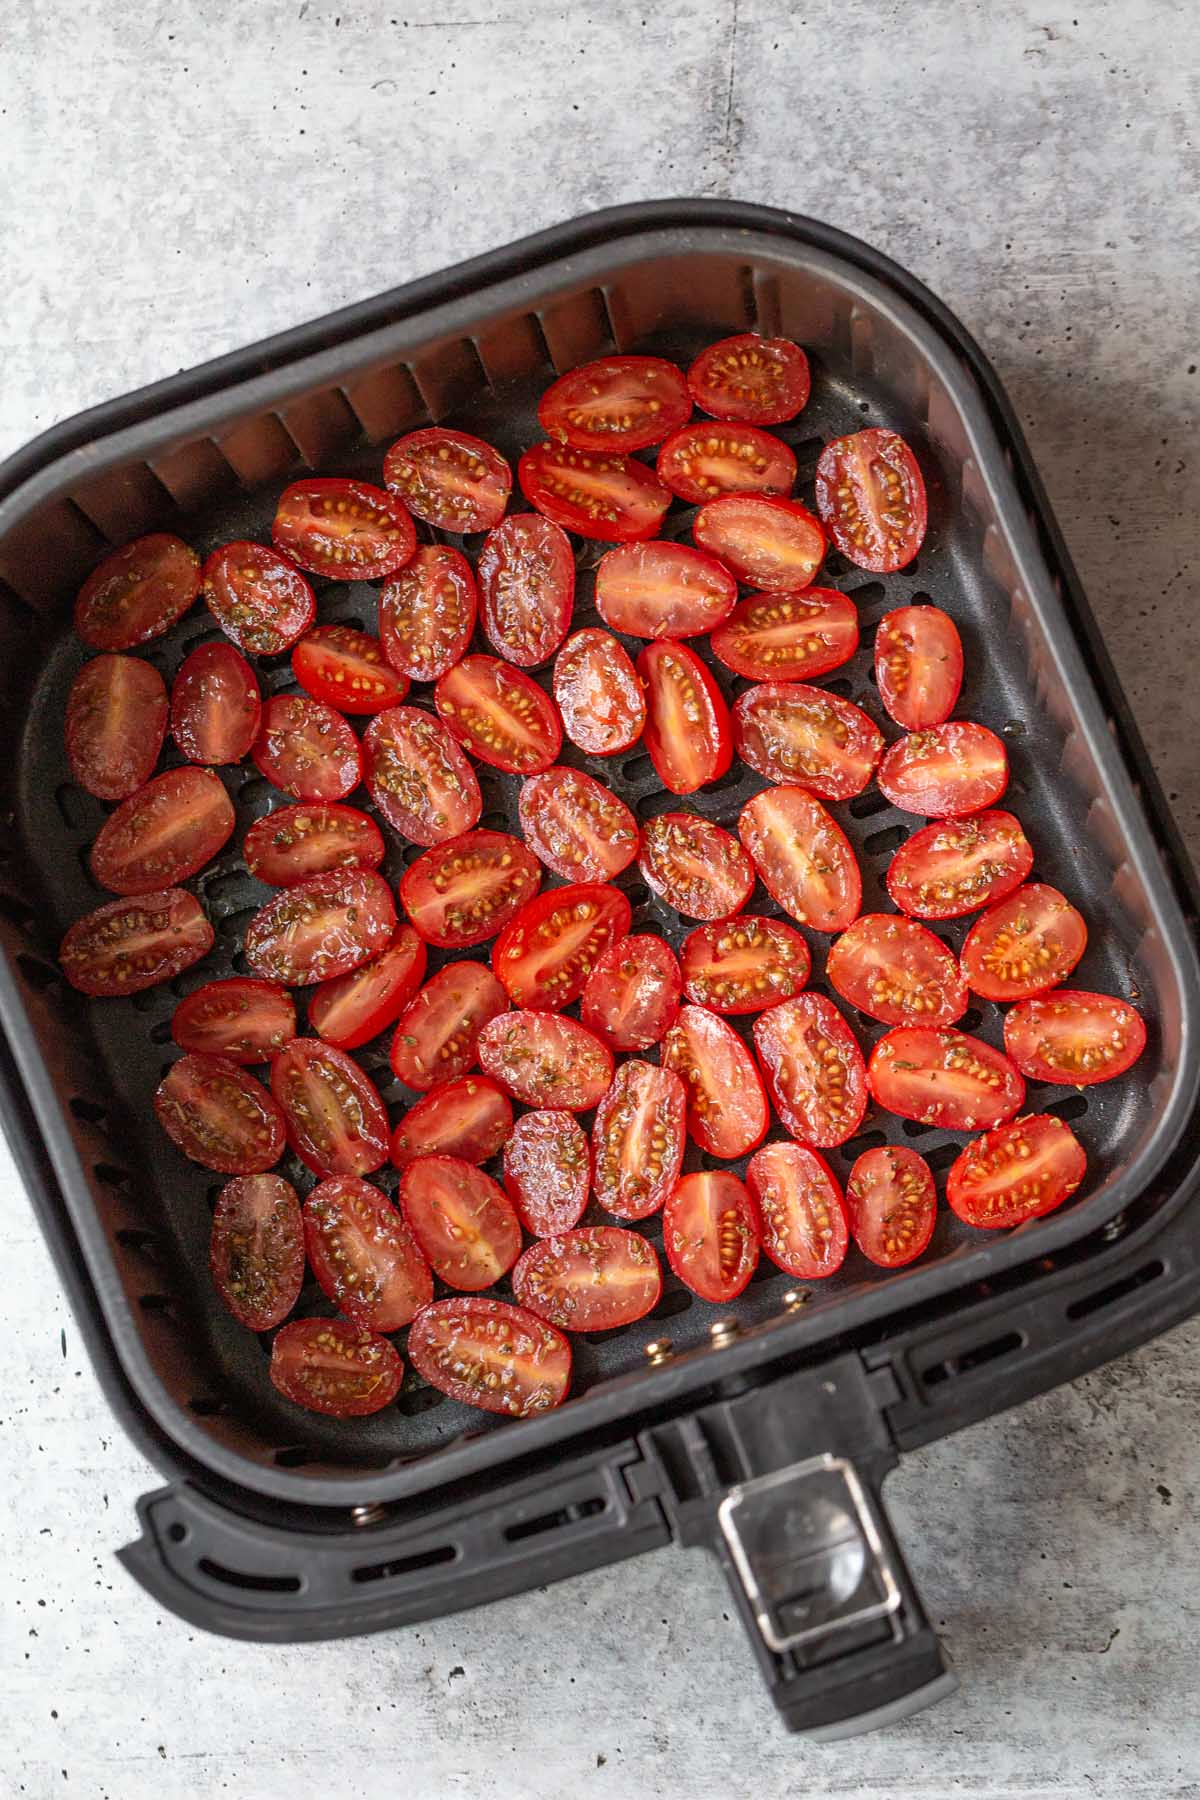 raw tomatoes in air fryer basket